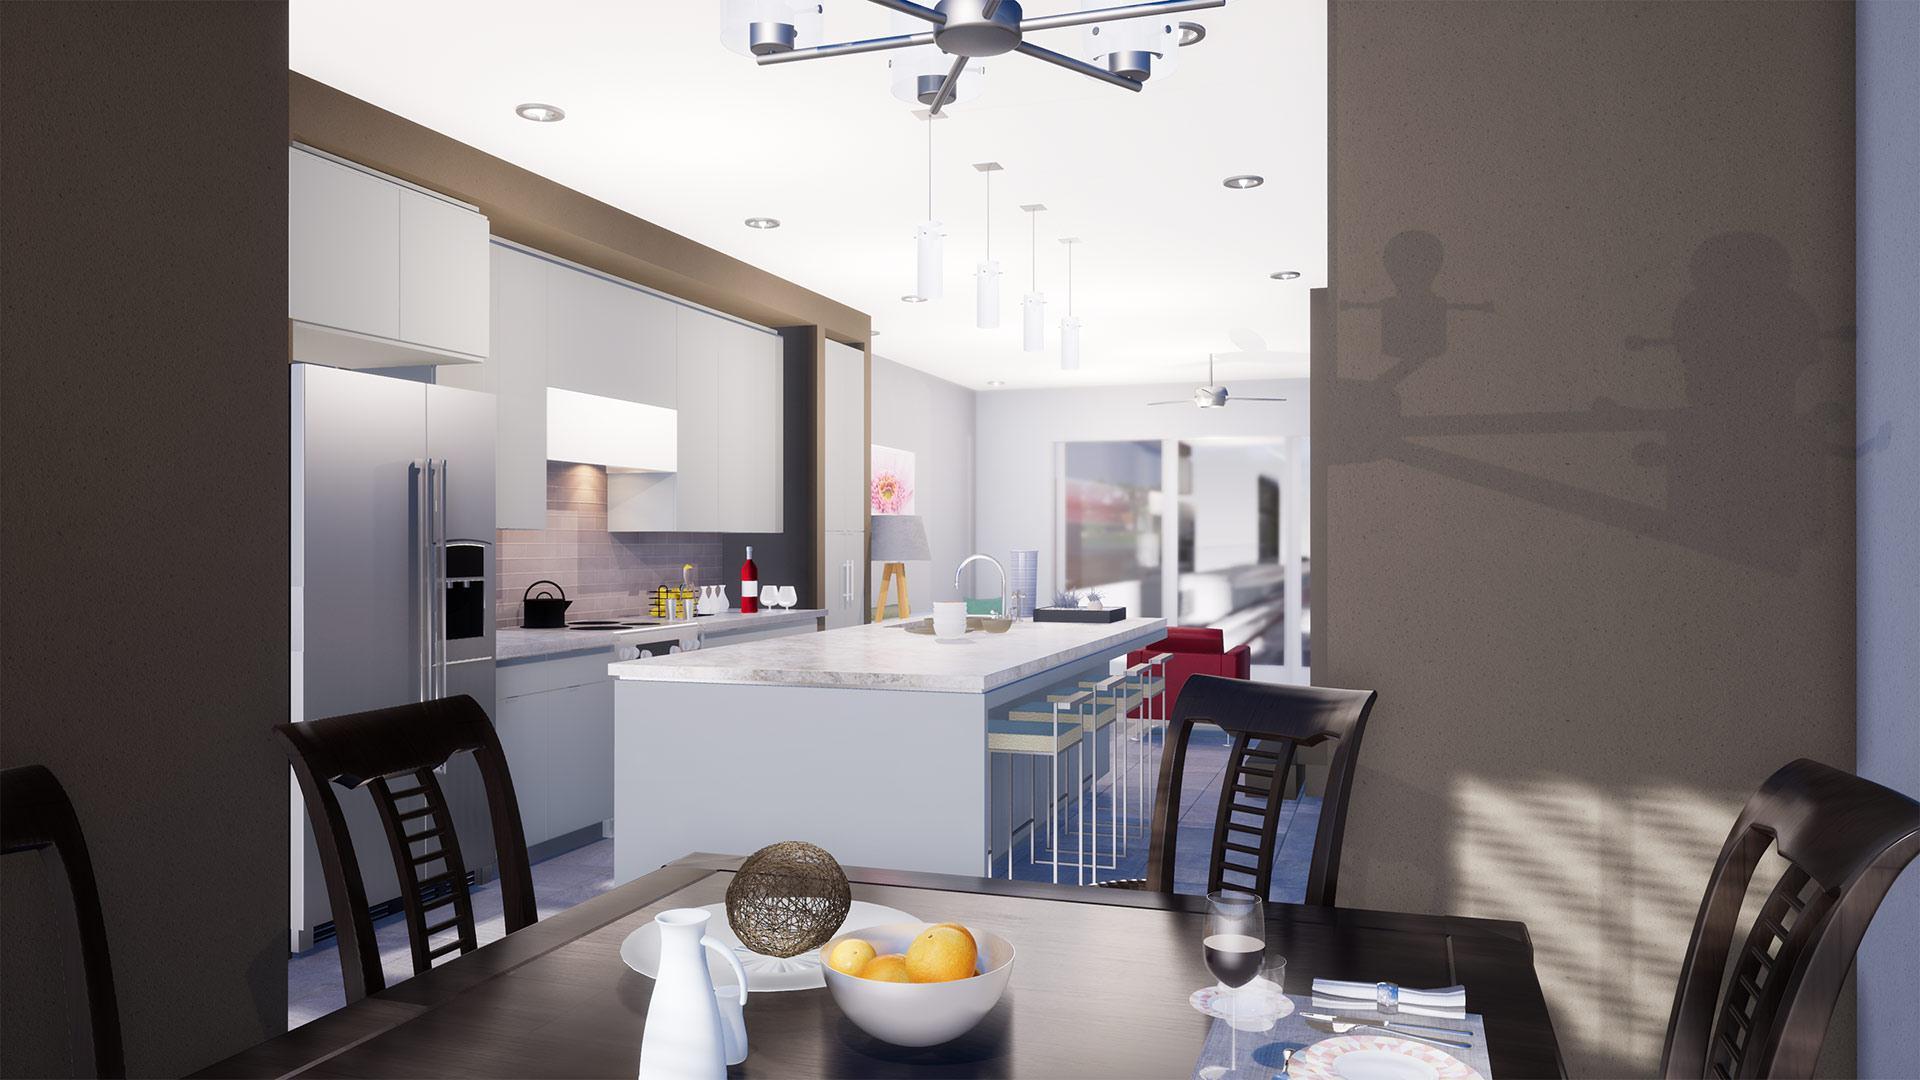 Kitchen featured in the Tramonti By Bellavista Homes in Orlando, FL